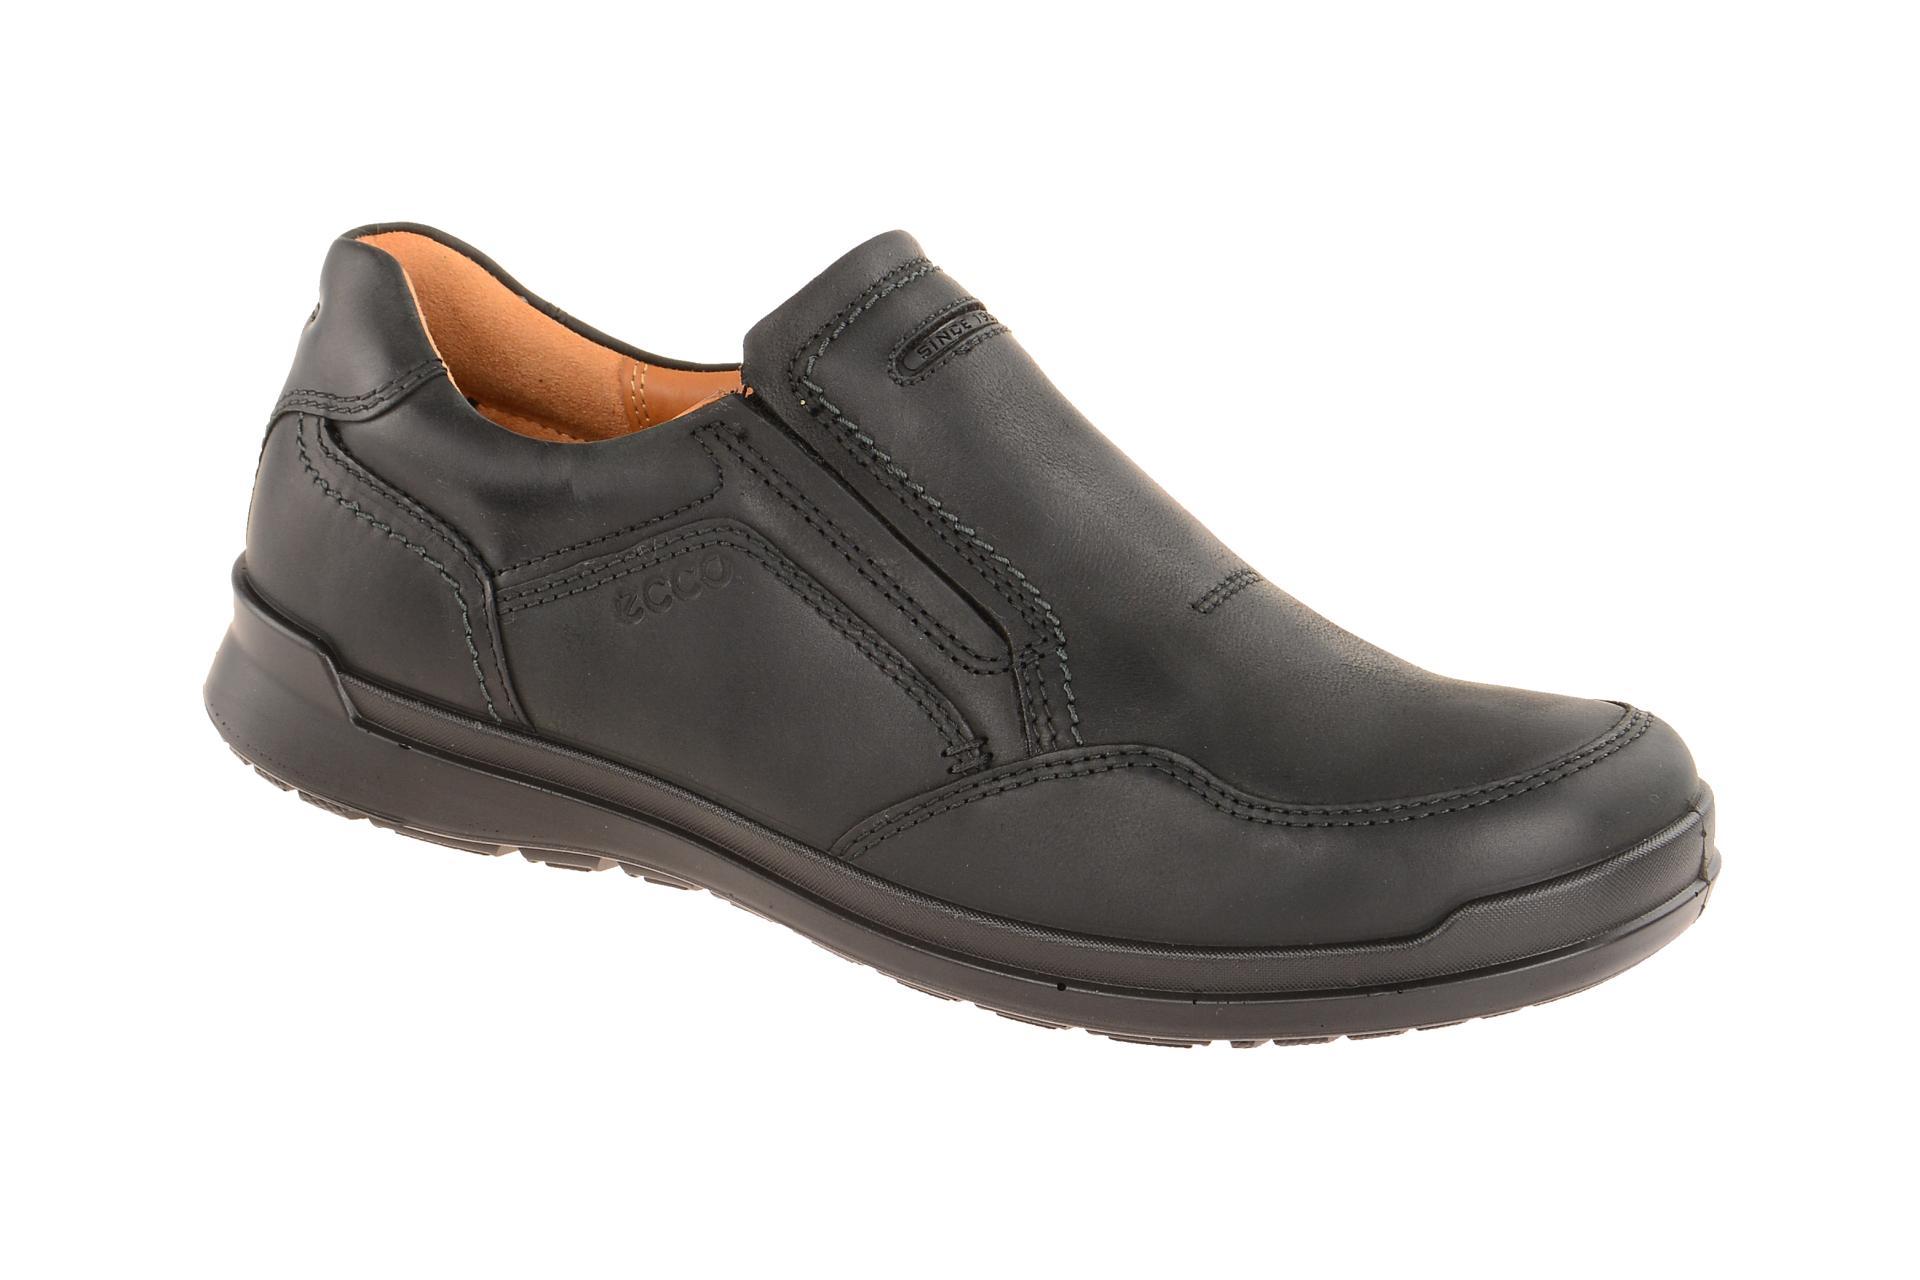 Details zu Ecco Schuhe HOWELL schwarz Herrenschuhe bequeme Slipper 52452402001 NEU